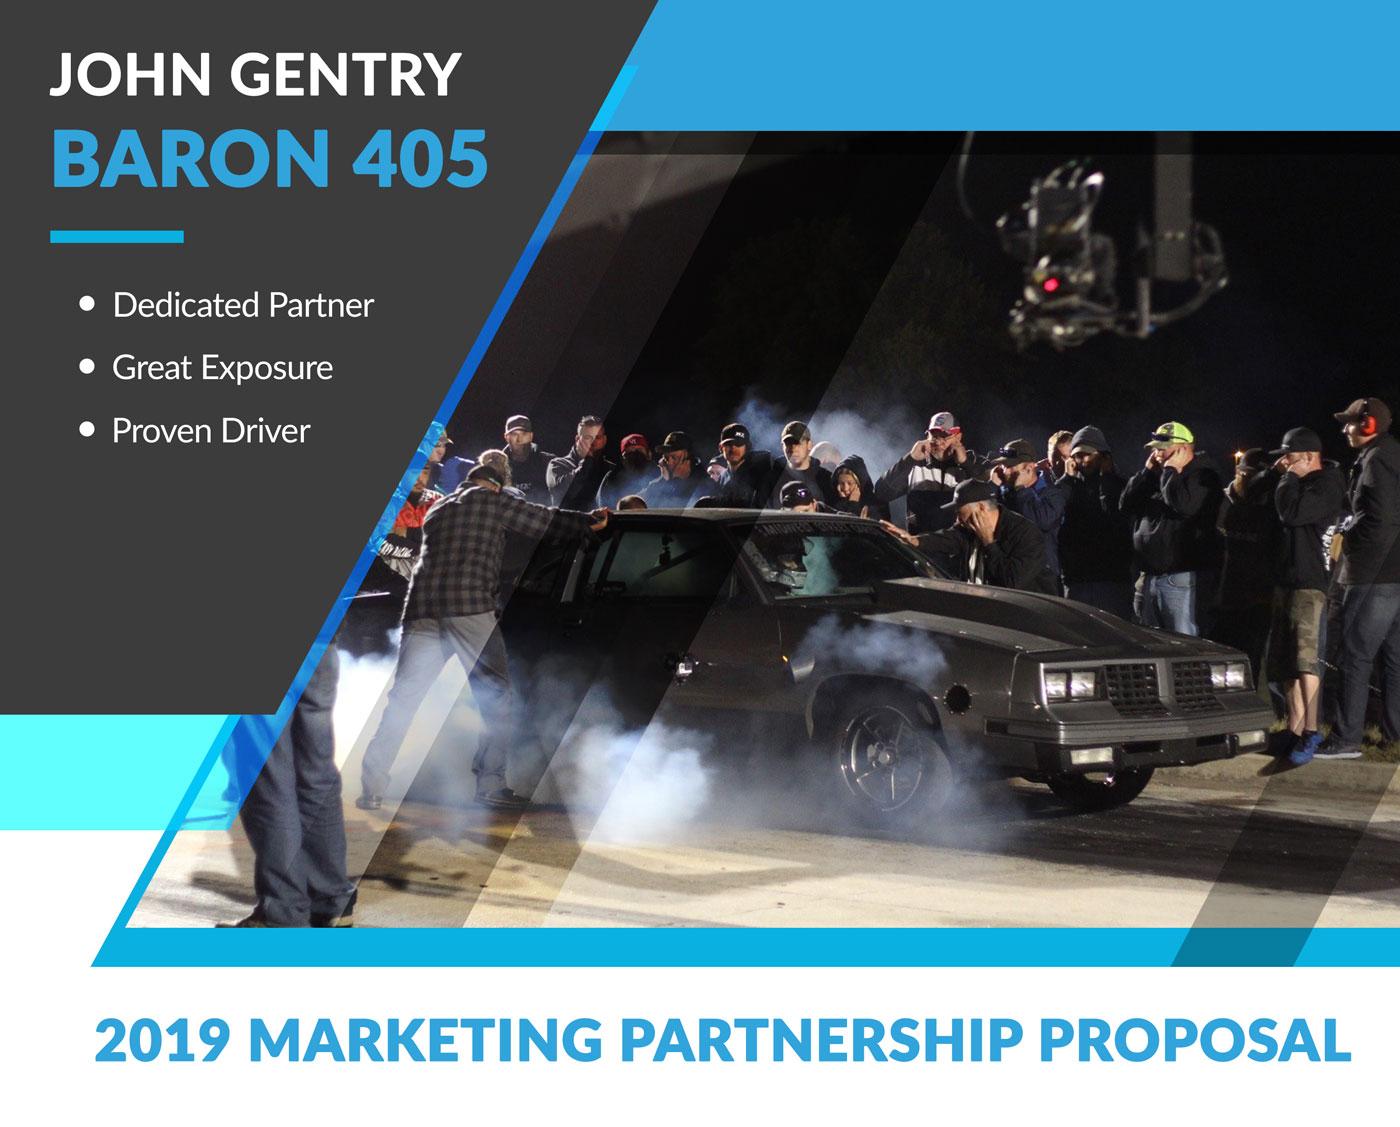 sponsorpacket-baron405